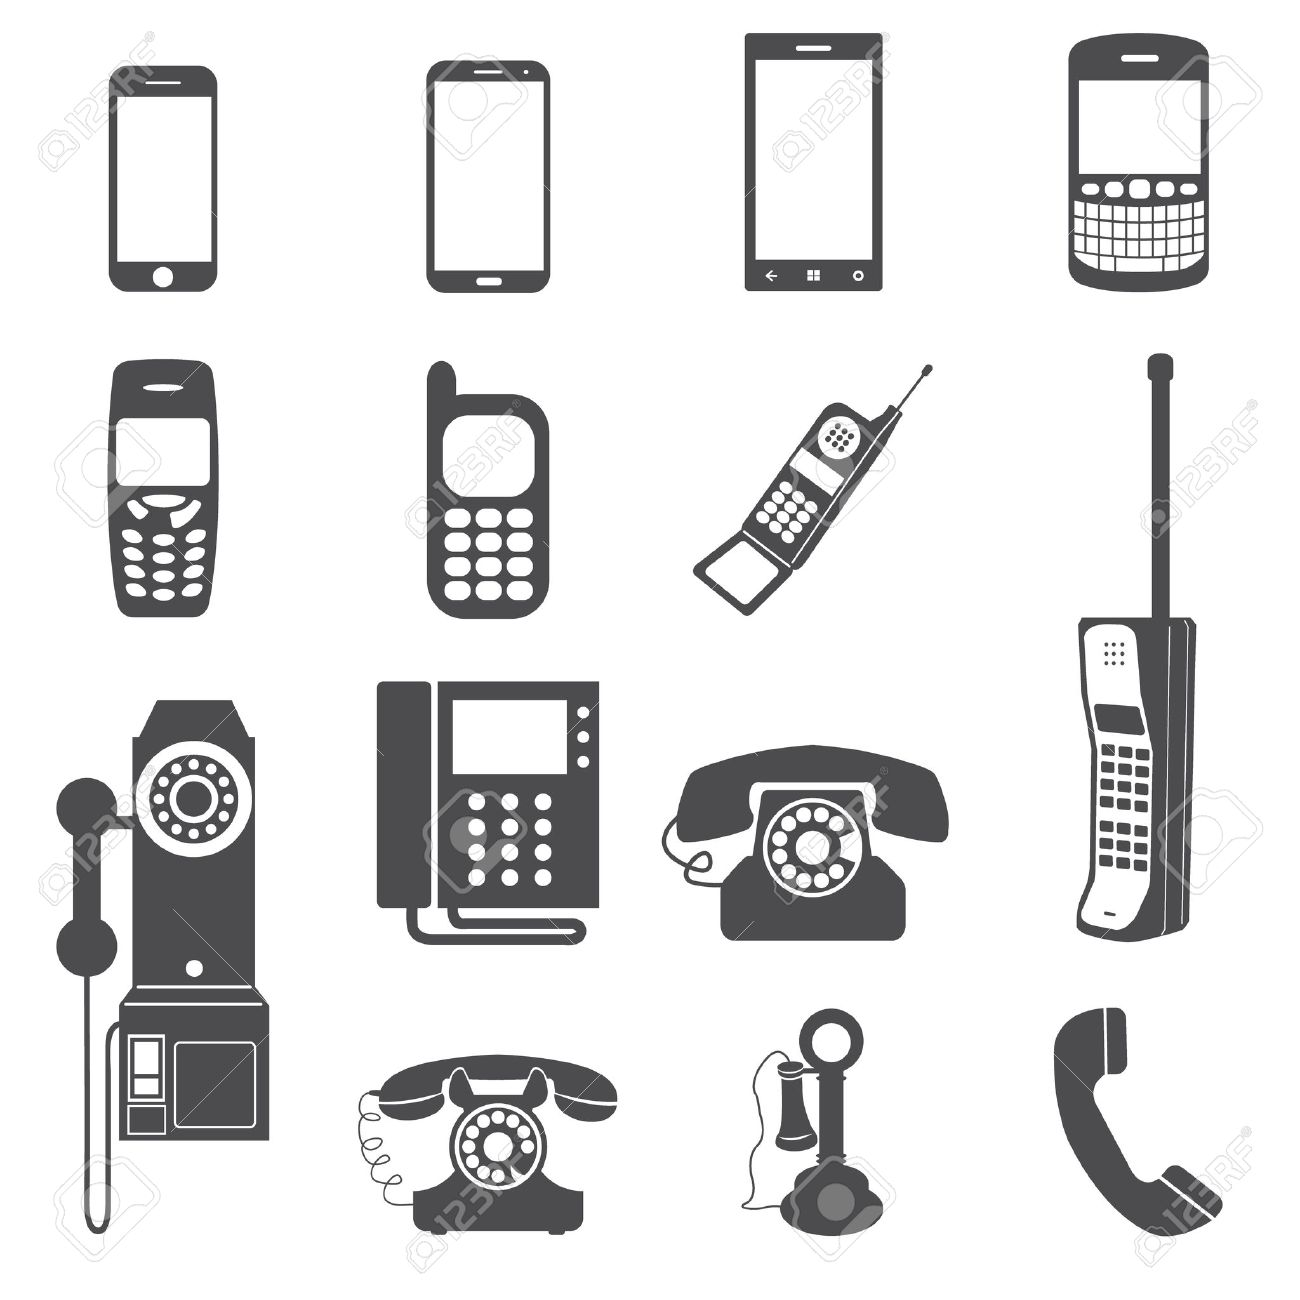 Evolution of telephone icon set - 29465306